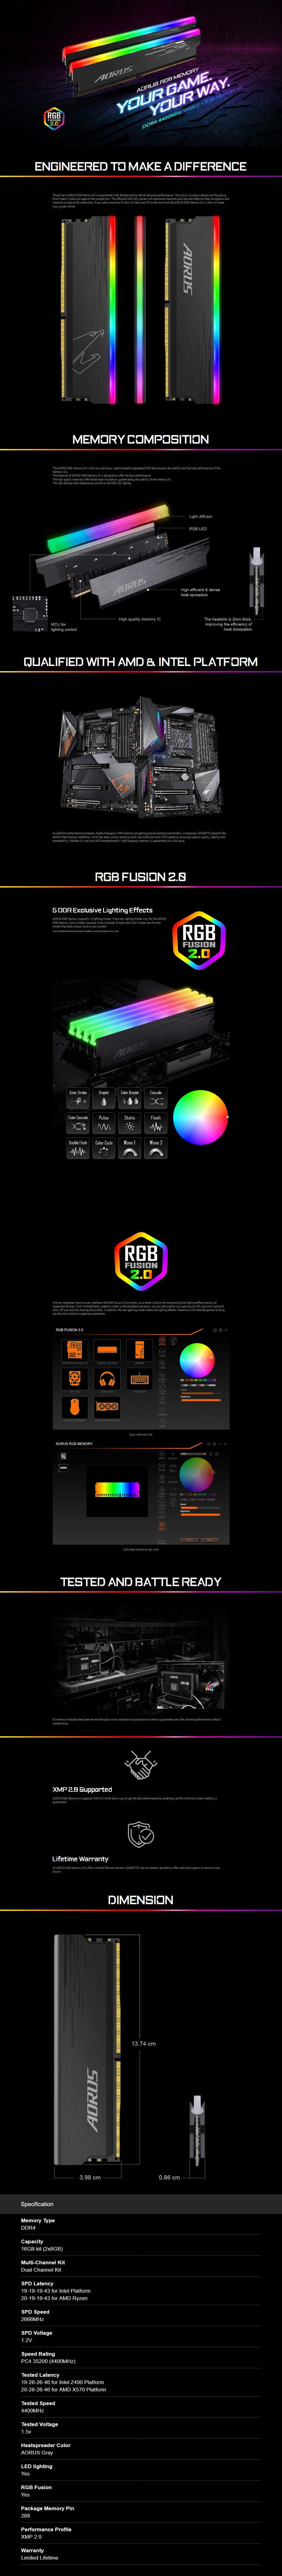 Gigabyte AORUS RGB 16GB (2x 8GB) DDR 4400MHz Memory - Overview 1